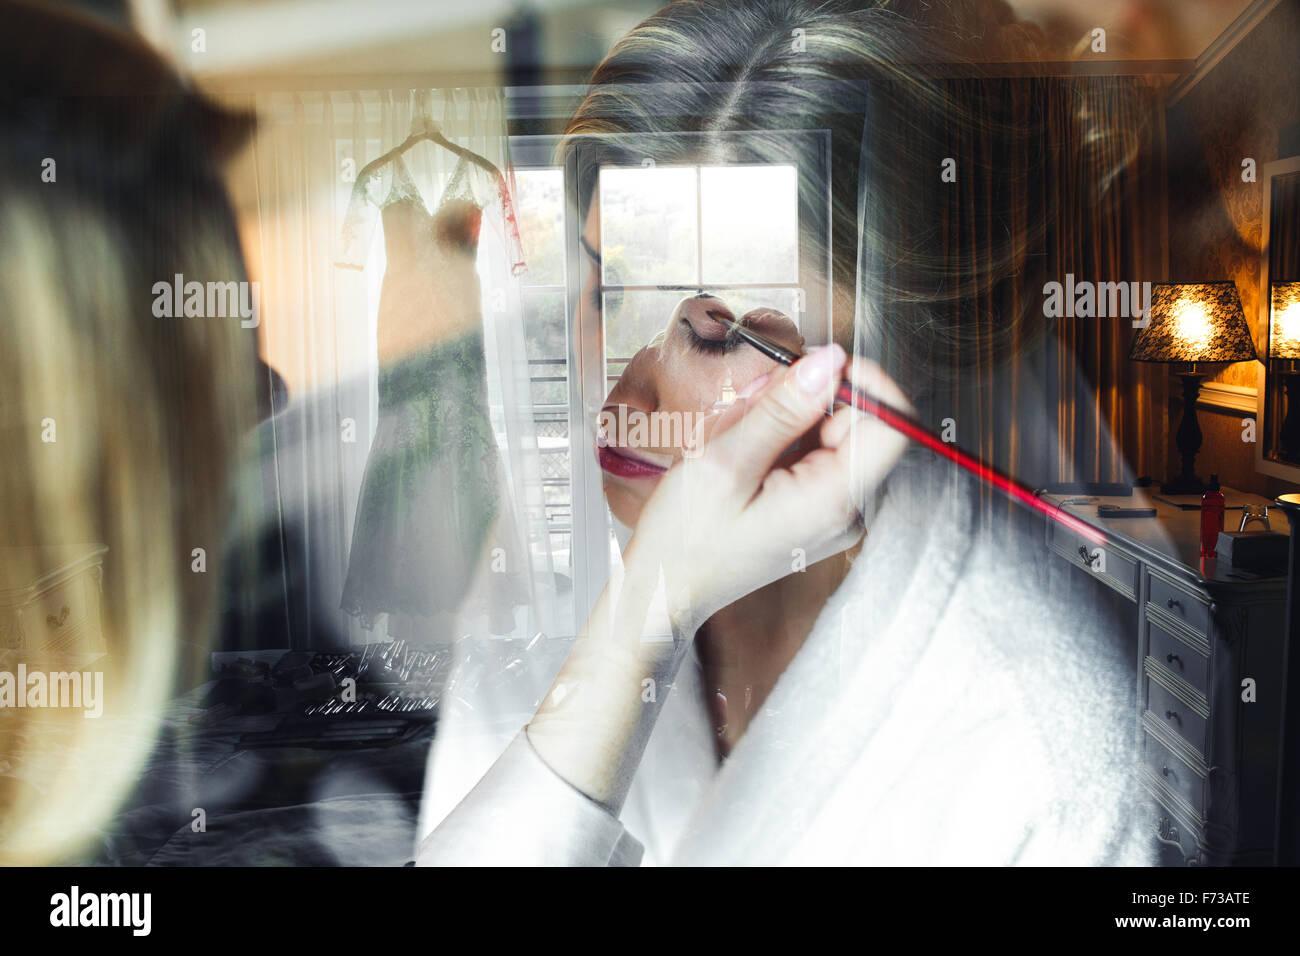 Aplicación de maquillaje para novia Imagen De Stock